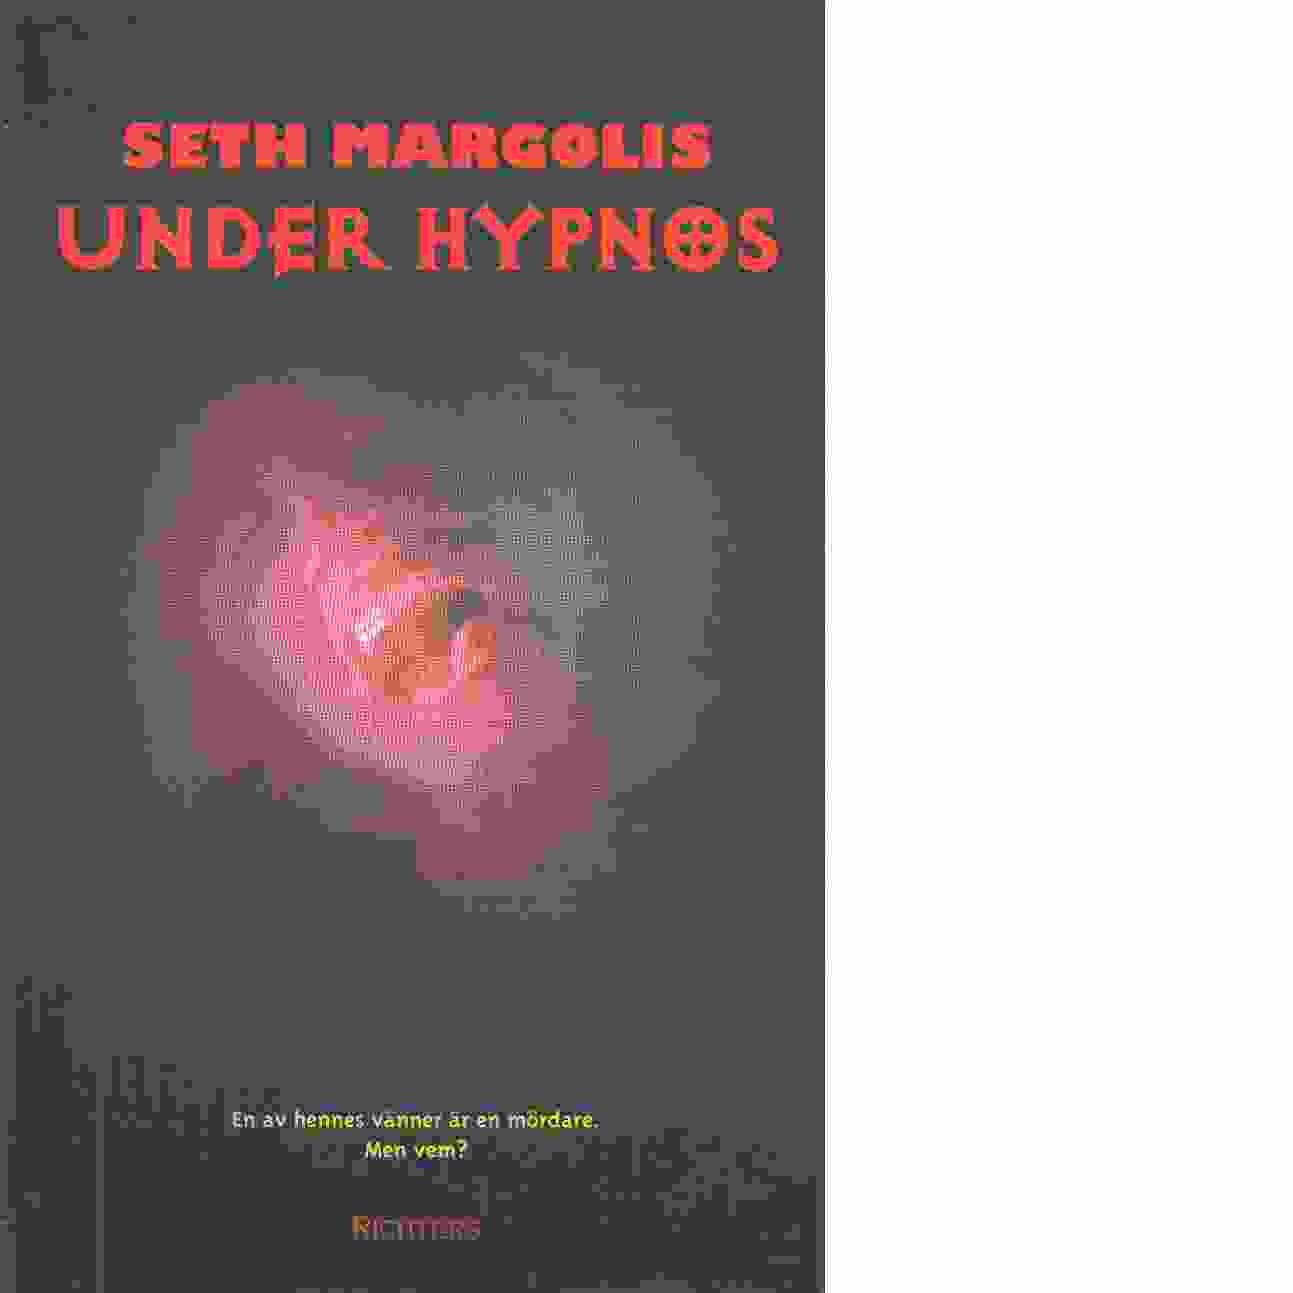 Under hypnos - Margolis, Seth